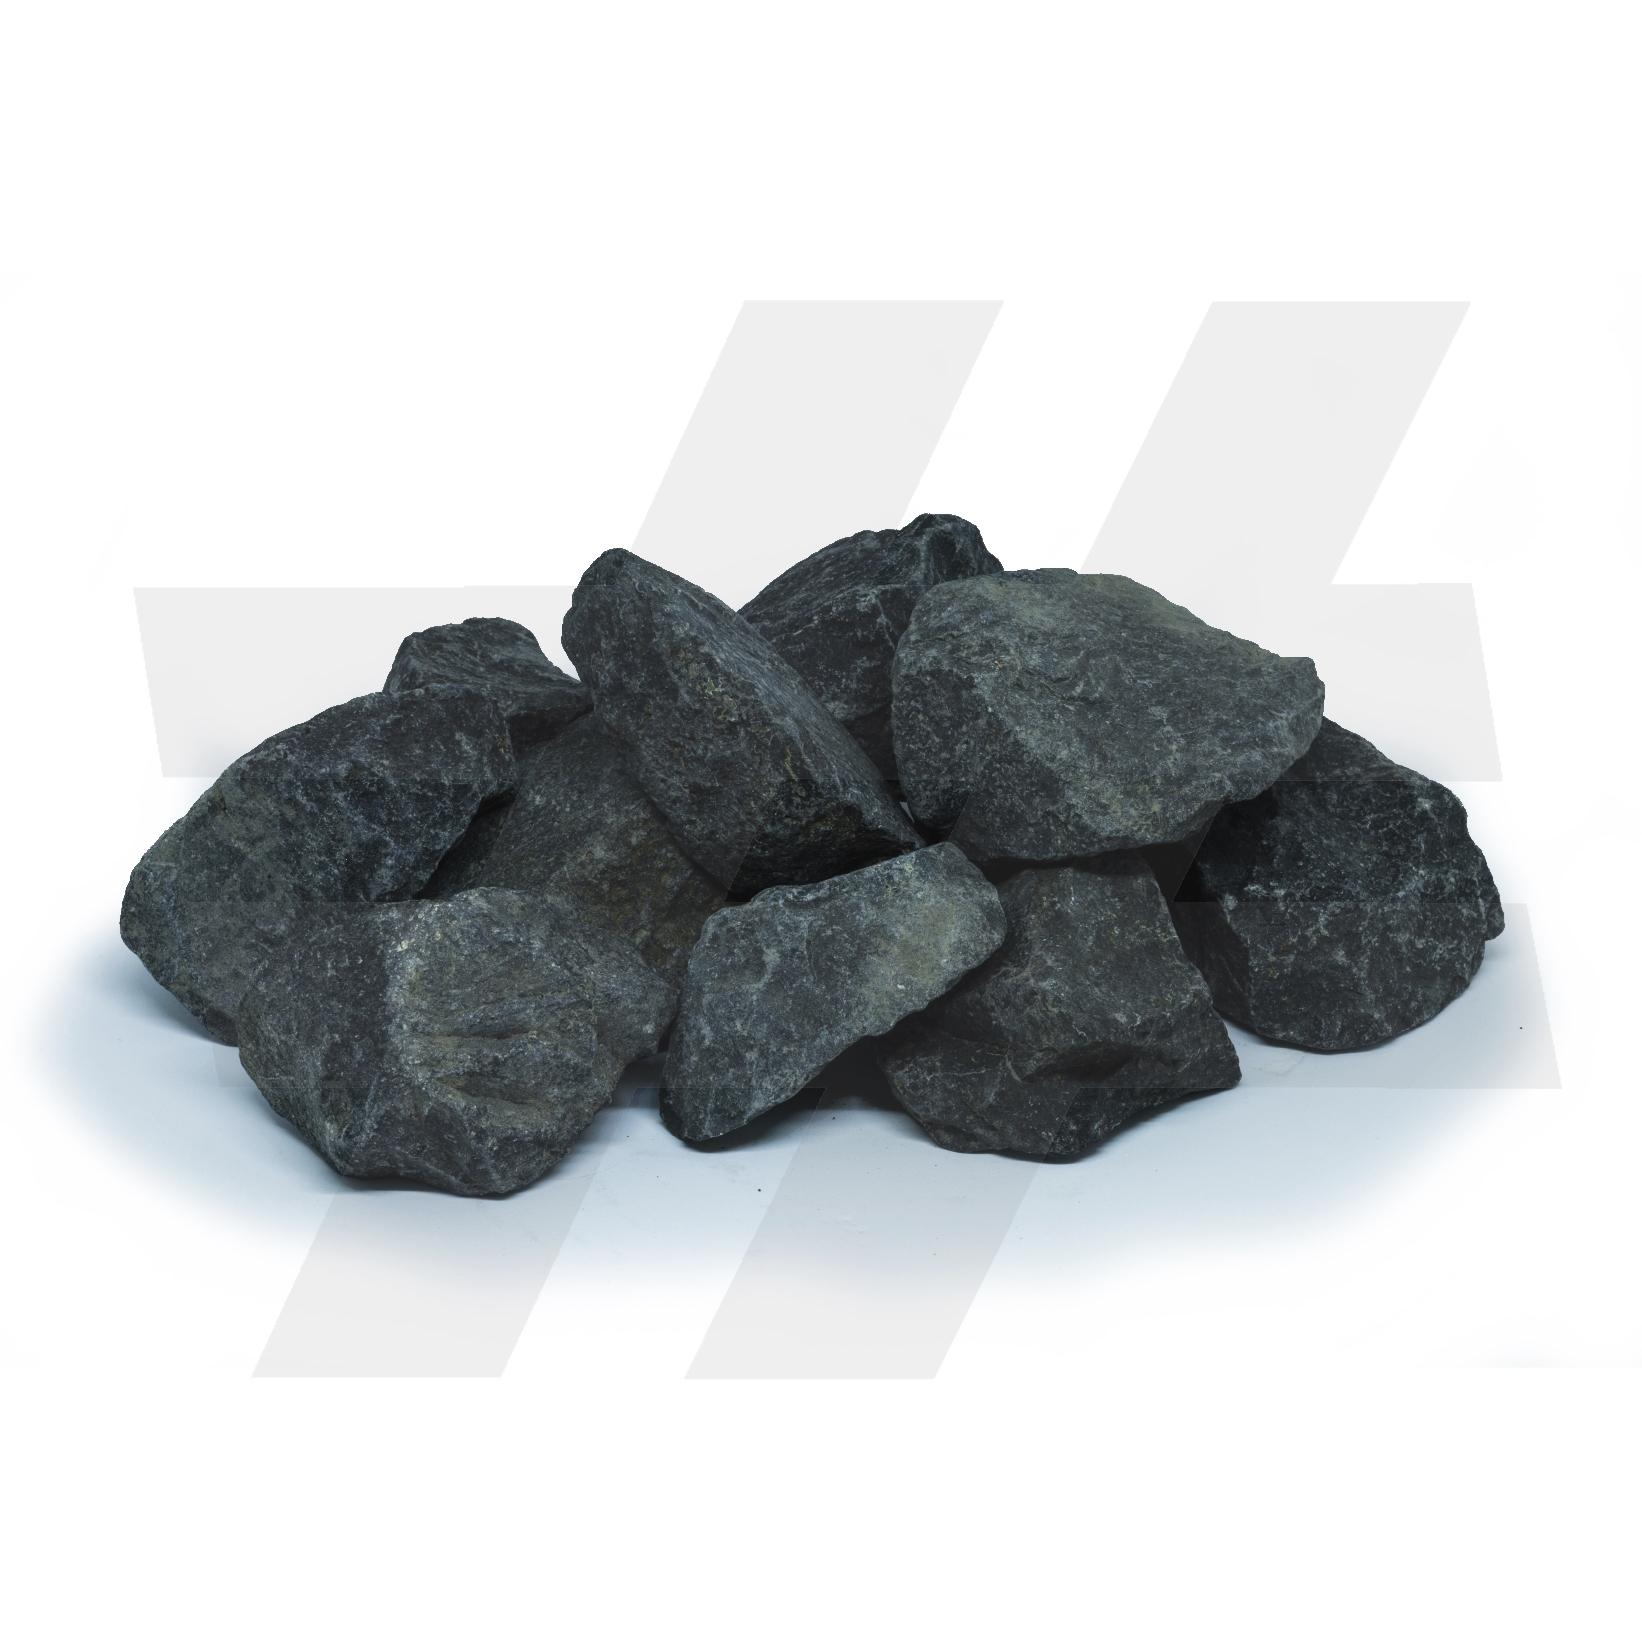 Basalt €0,12 /kg